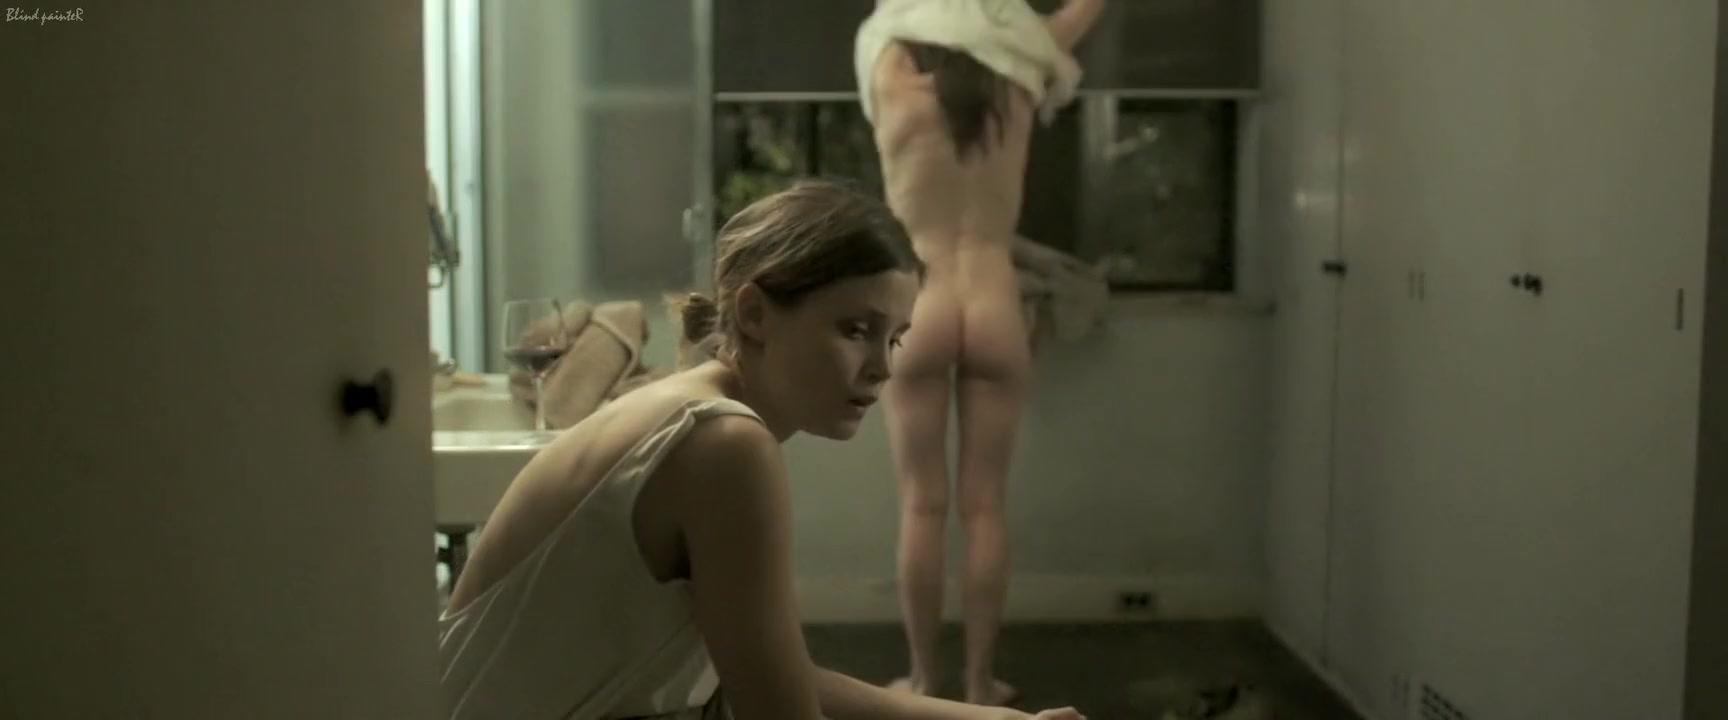 The Sleepwalker (2014) Stephanie Ellis Lita Phoenix had fucked her teacher